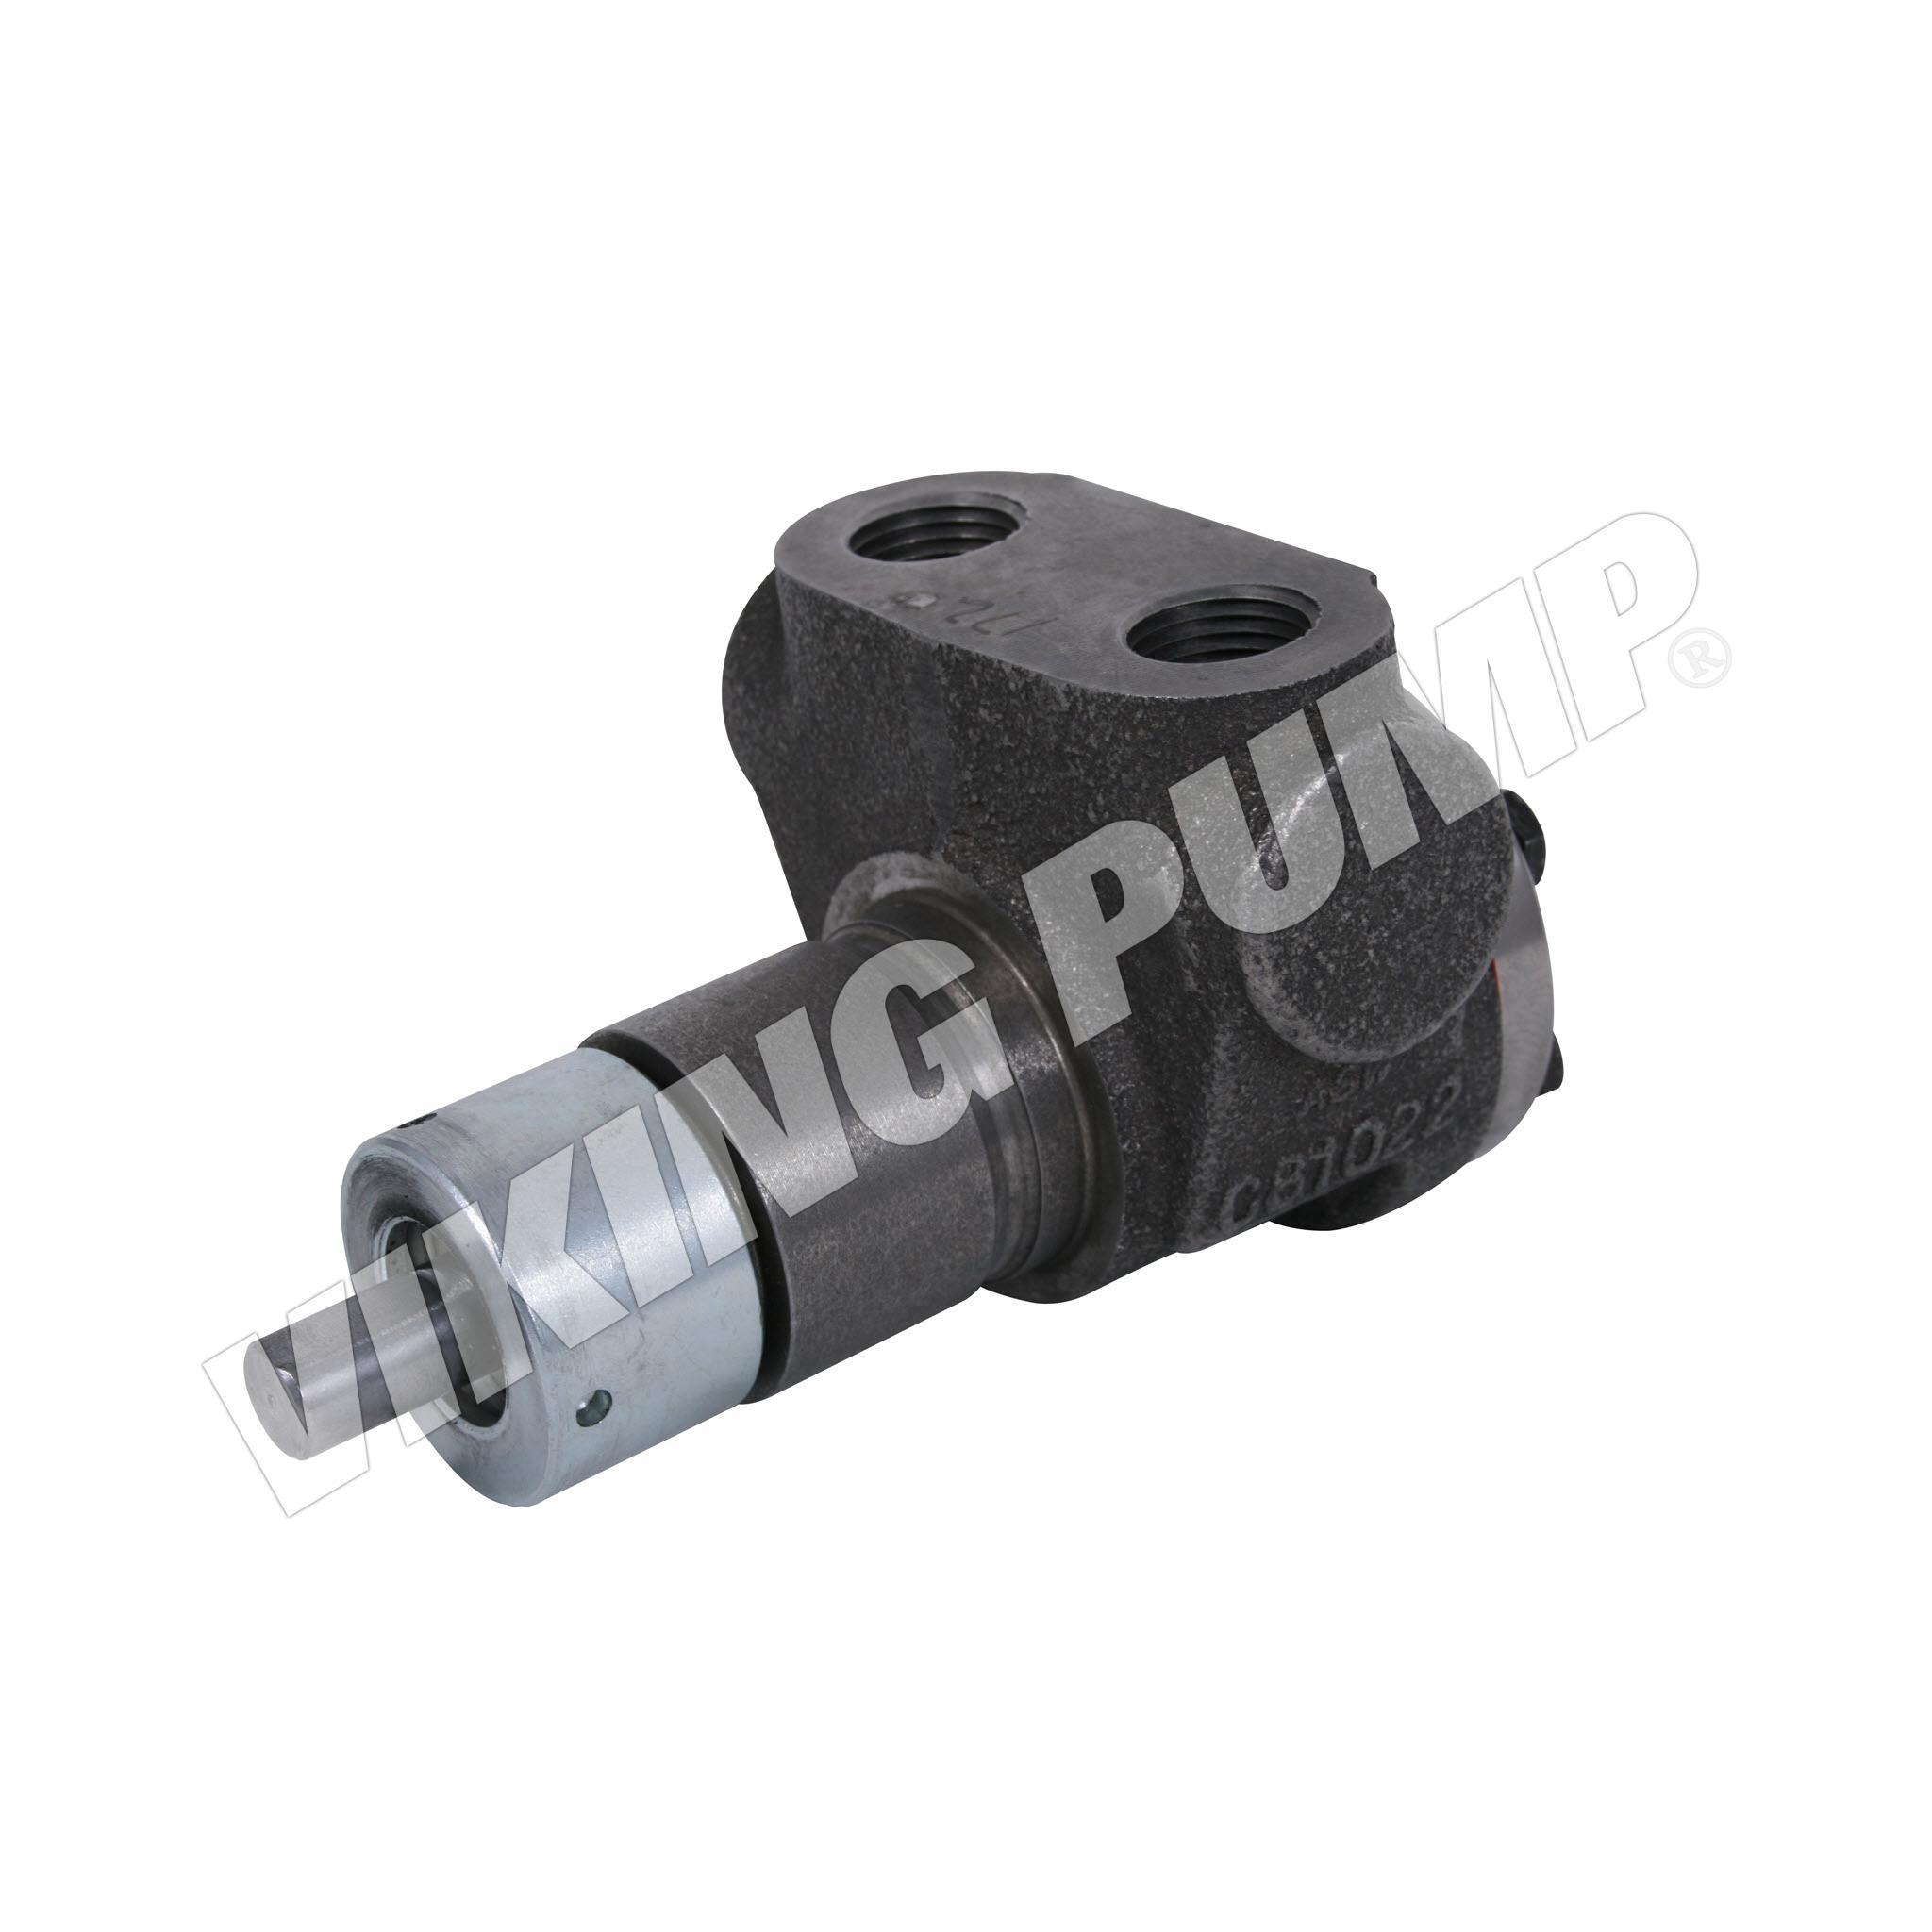 Model 456, Unmounted, Mechanical Seal Pump